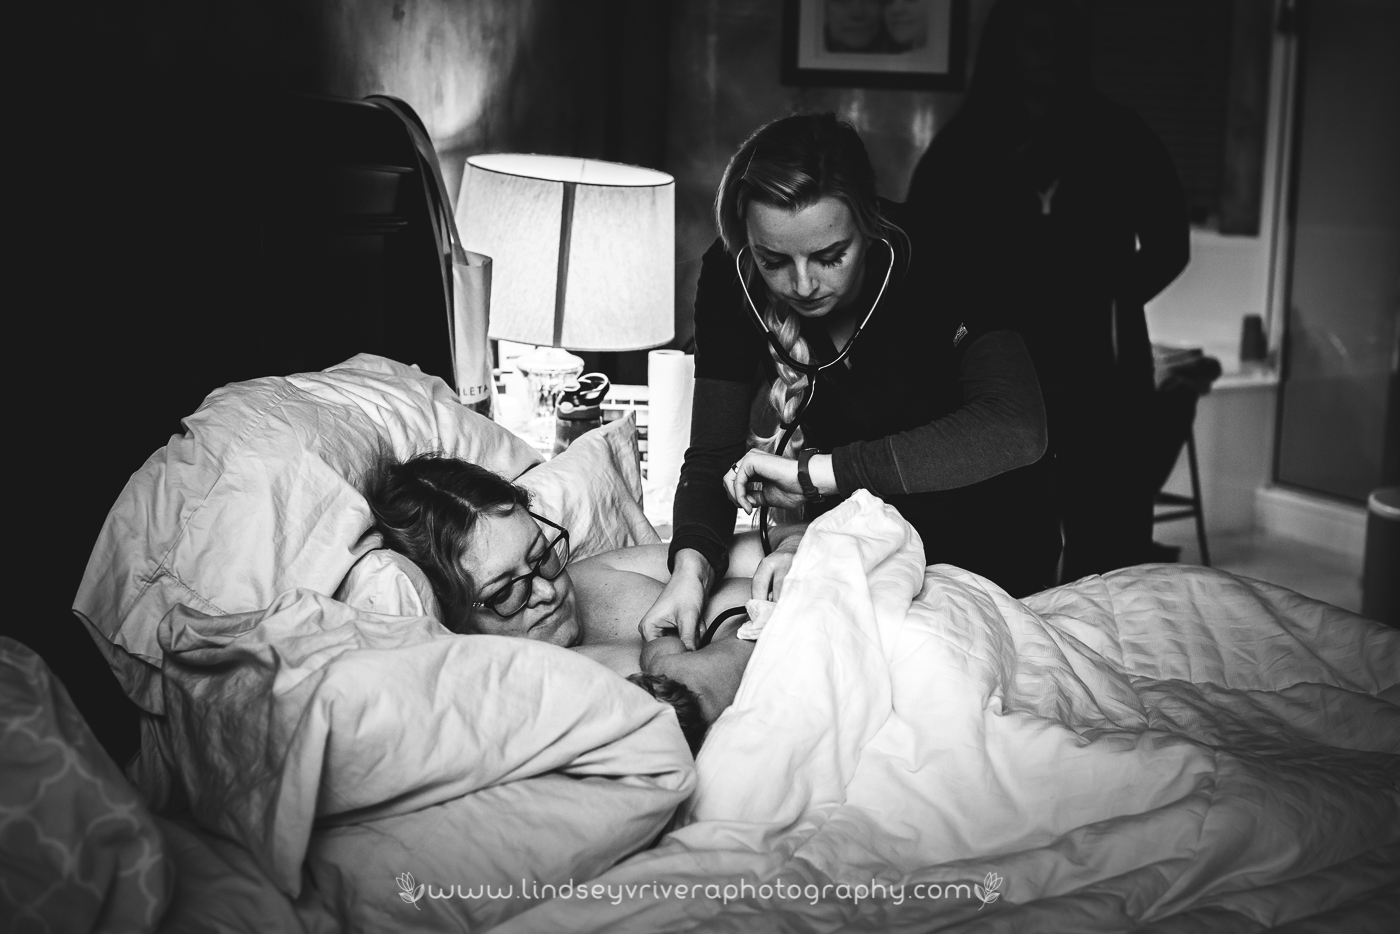 Home-Birth-Born-Photography-Salt-Lake-City,-Wasatch-Midwifery-&-Wellness,-Just-Born51.jpg